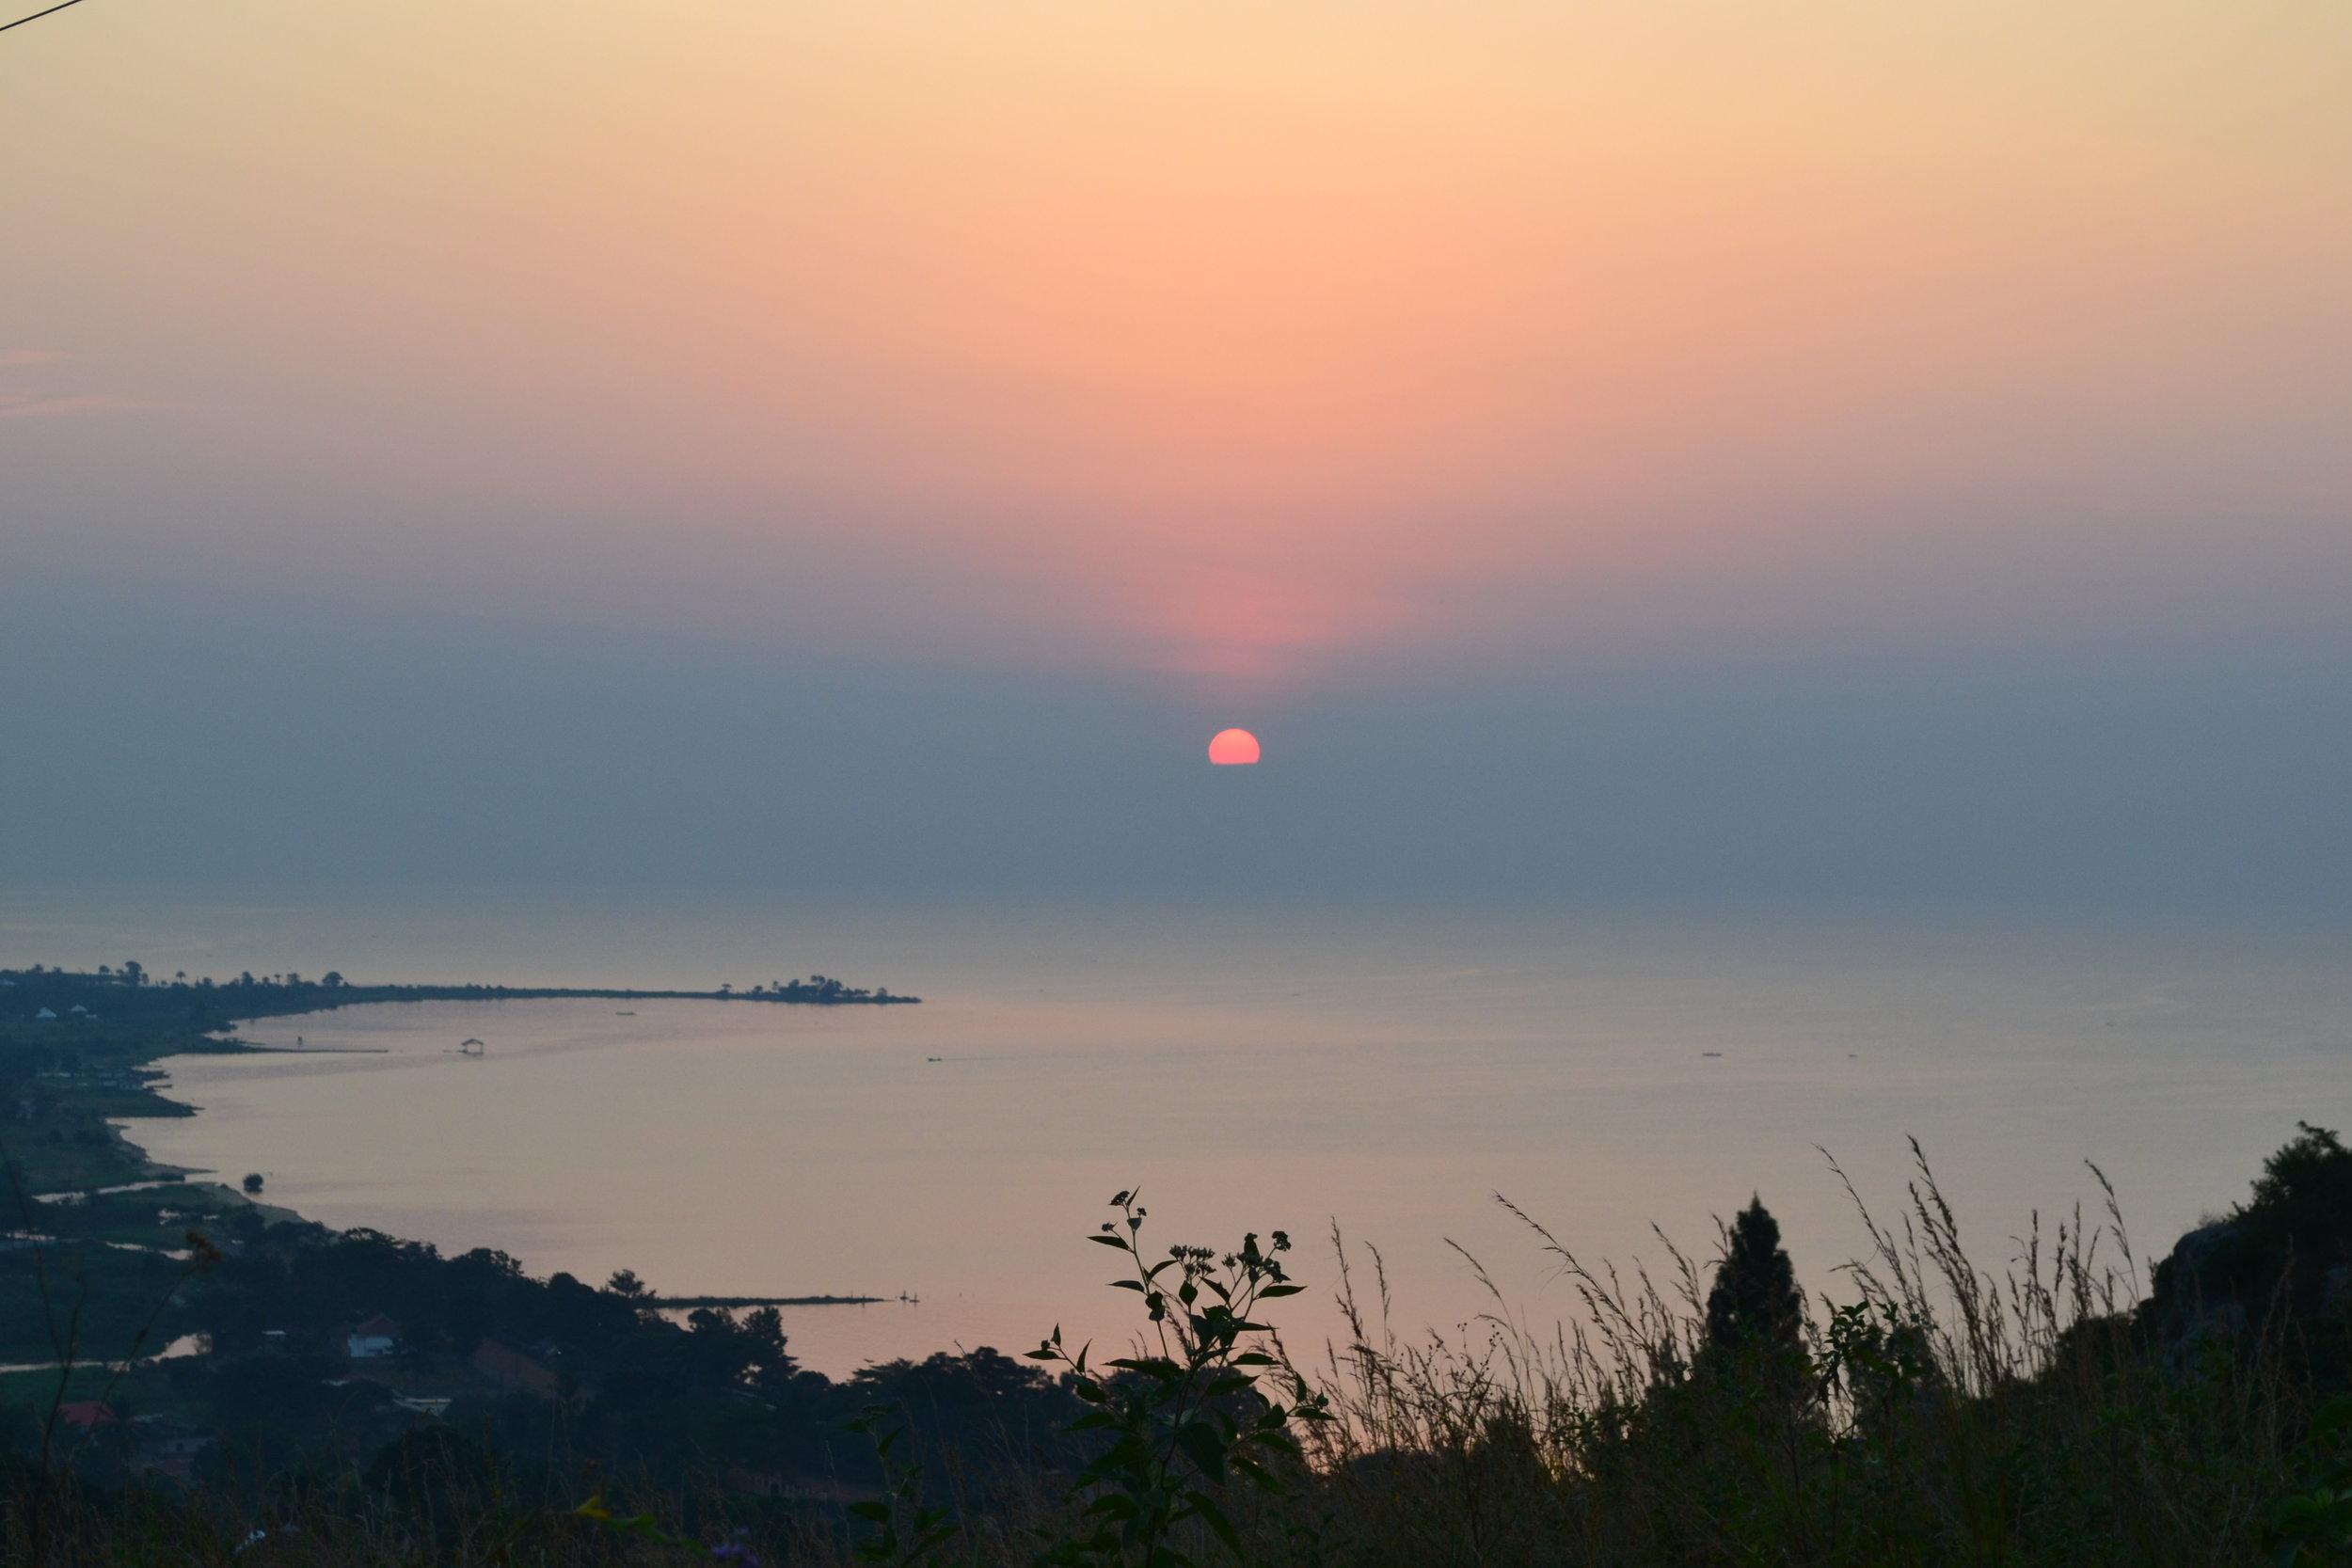 New beginnings: sunrise over Bukoba, Tanzania in June 2019.